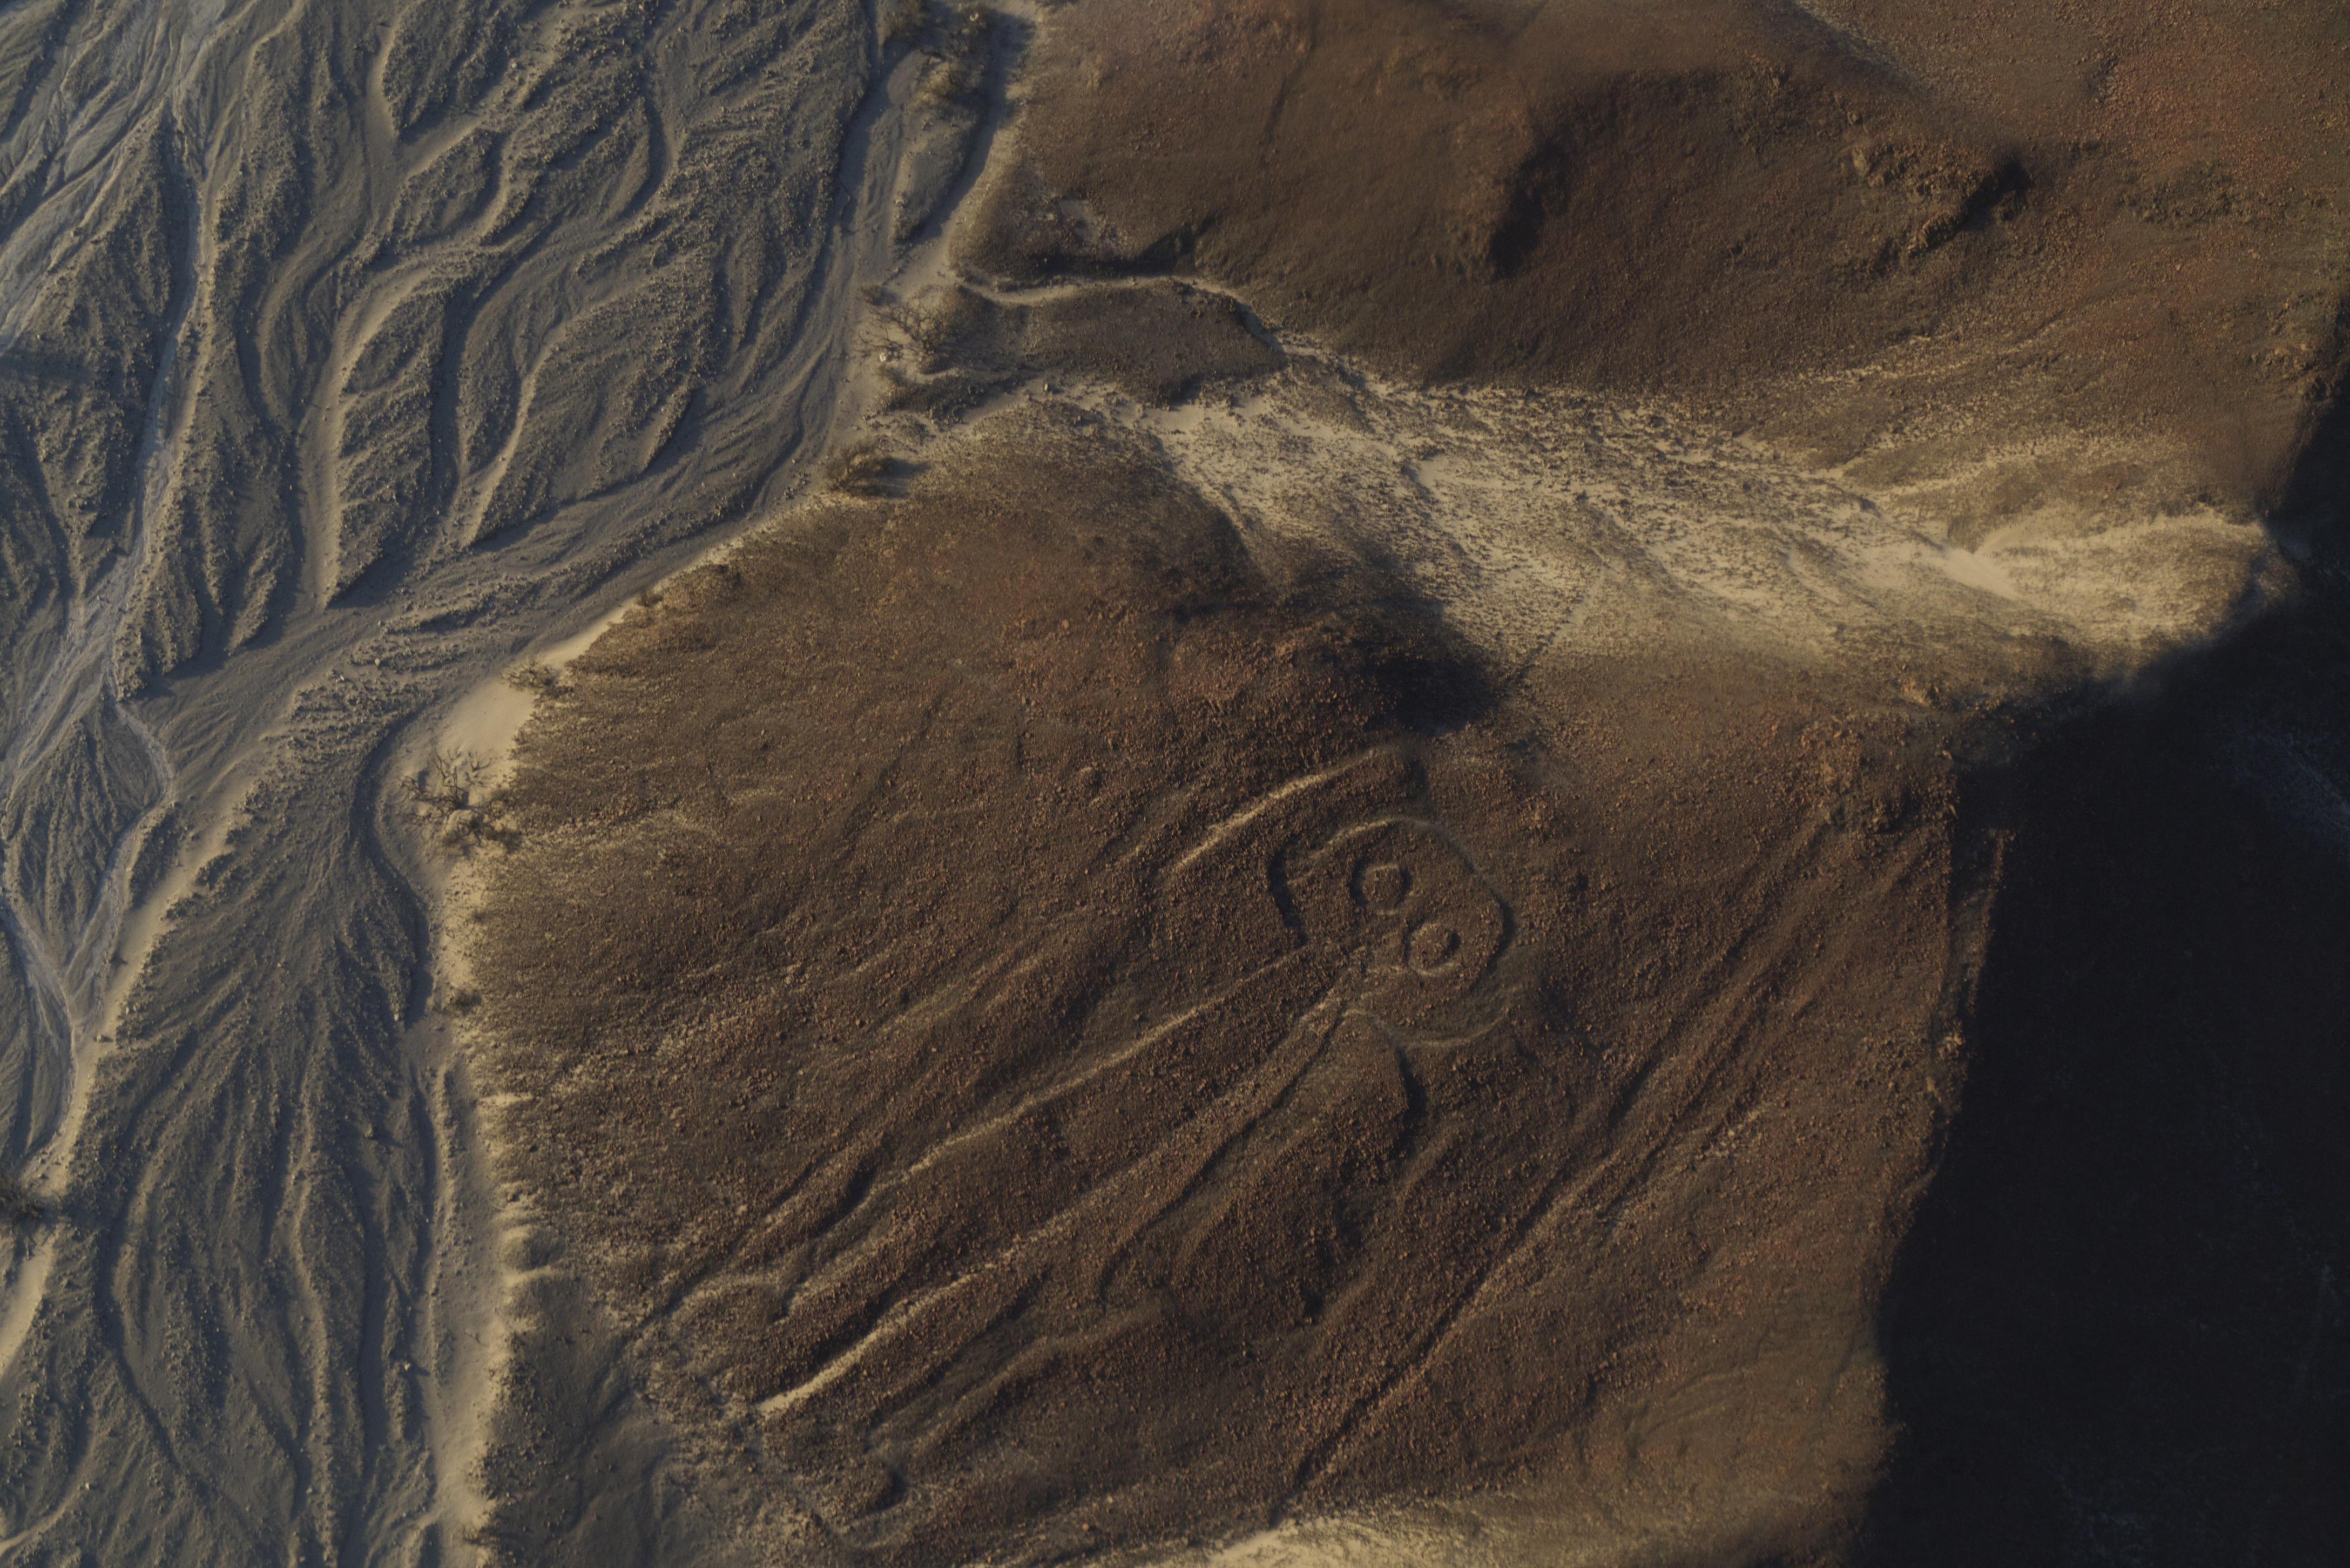 Salve Nazca